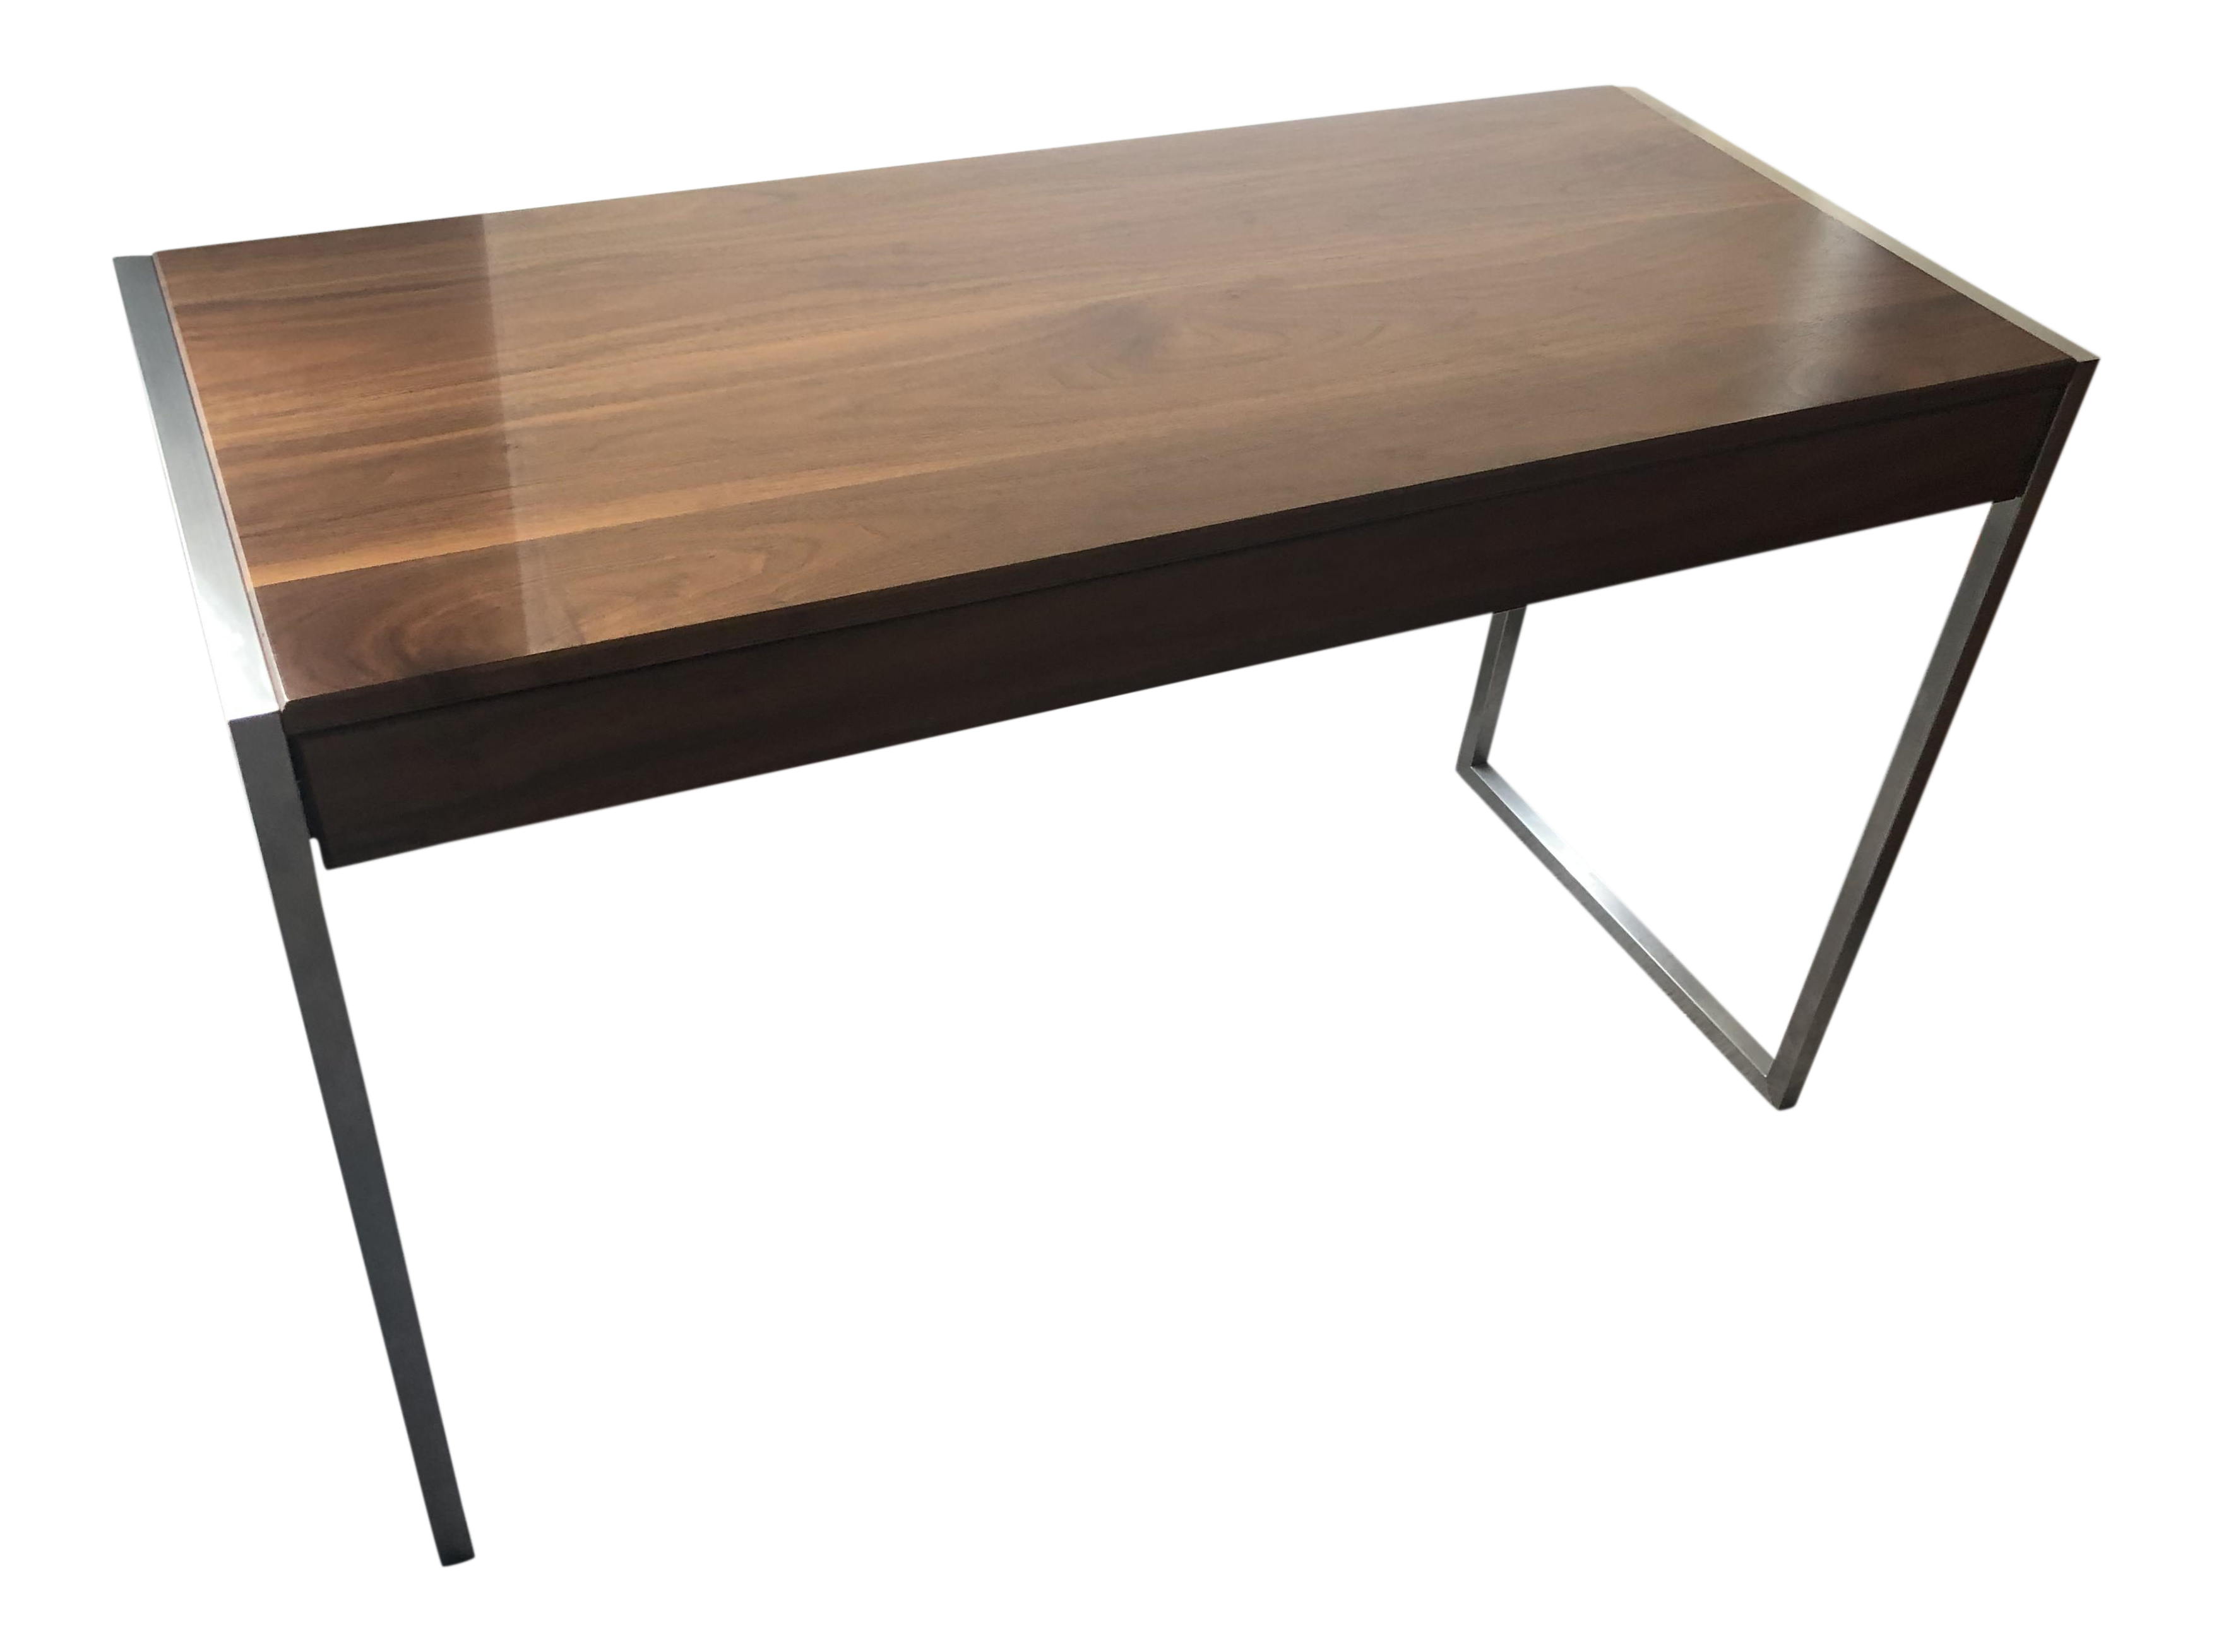 contemporary room board walnut basis desk chairish rh chairish com room and board desk chair room and board leaning desk